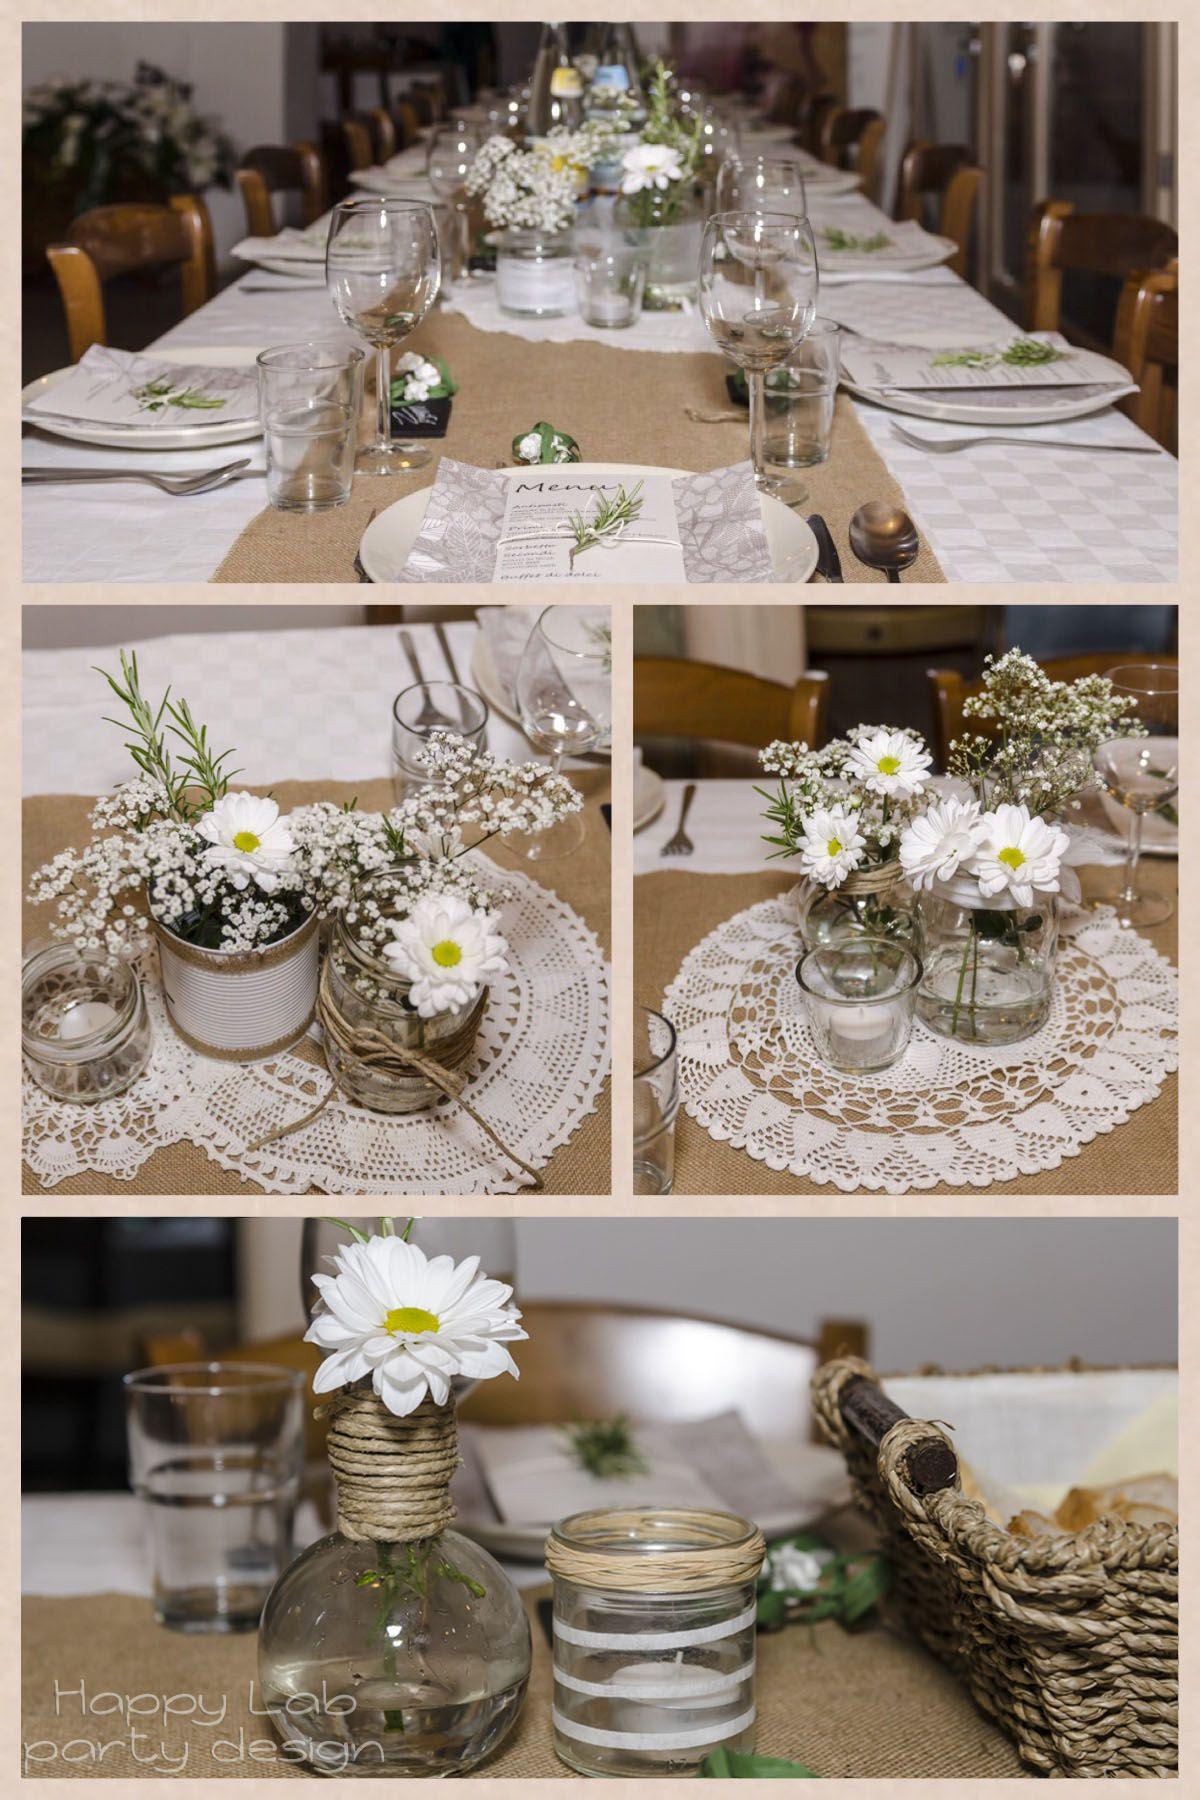 Matrimonio Rustico Como : Matrimonio rustico rustic wedding runner di iuta burlap pizzi